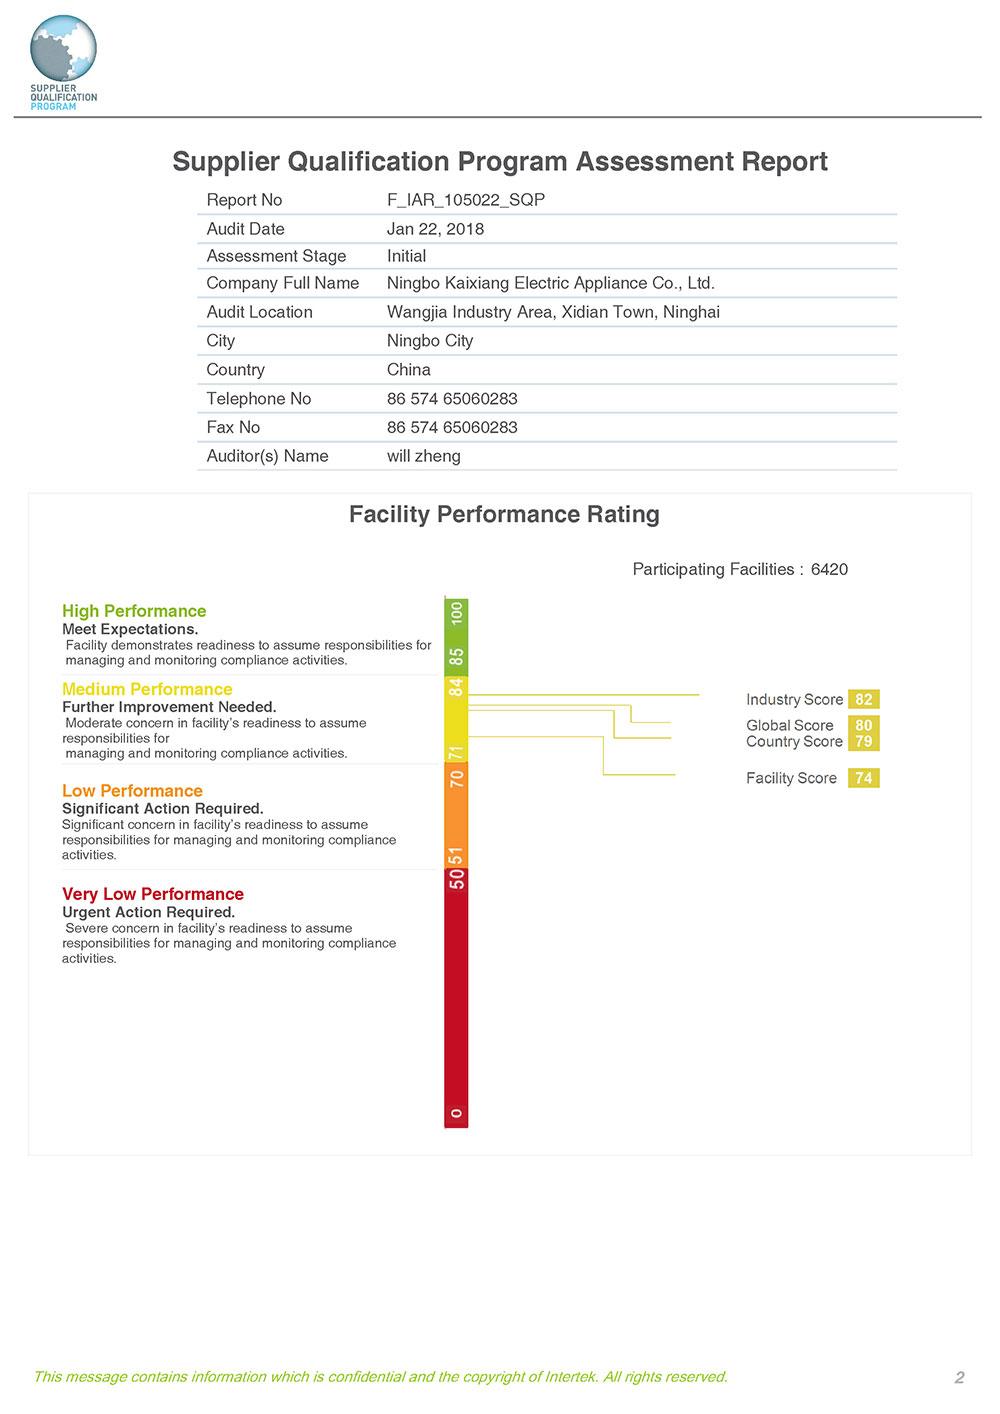 Supplier Qualification Program Assessment Report